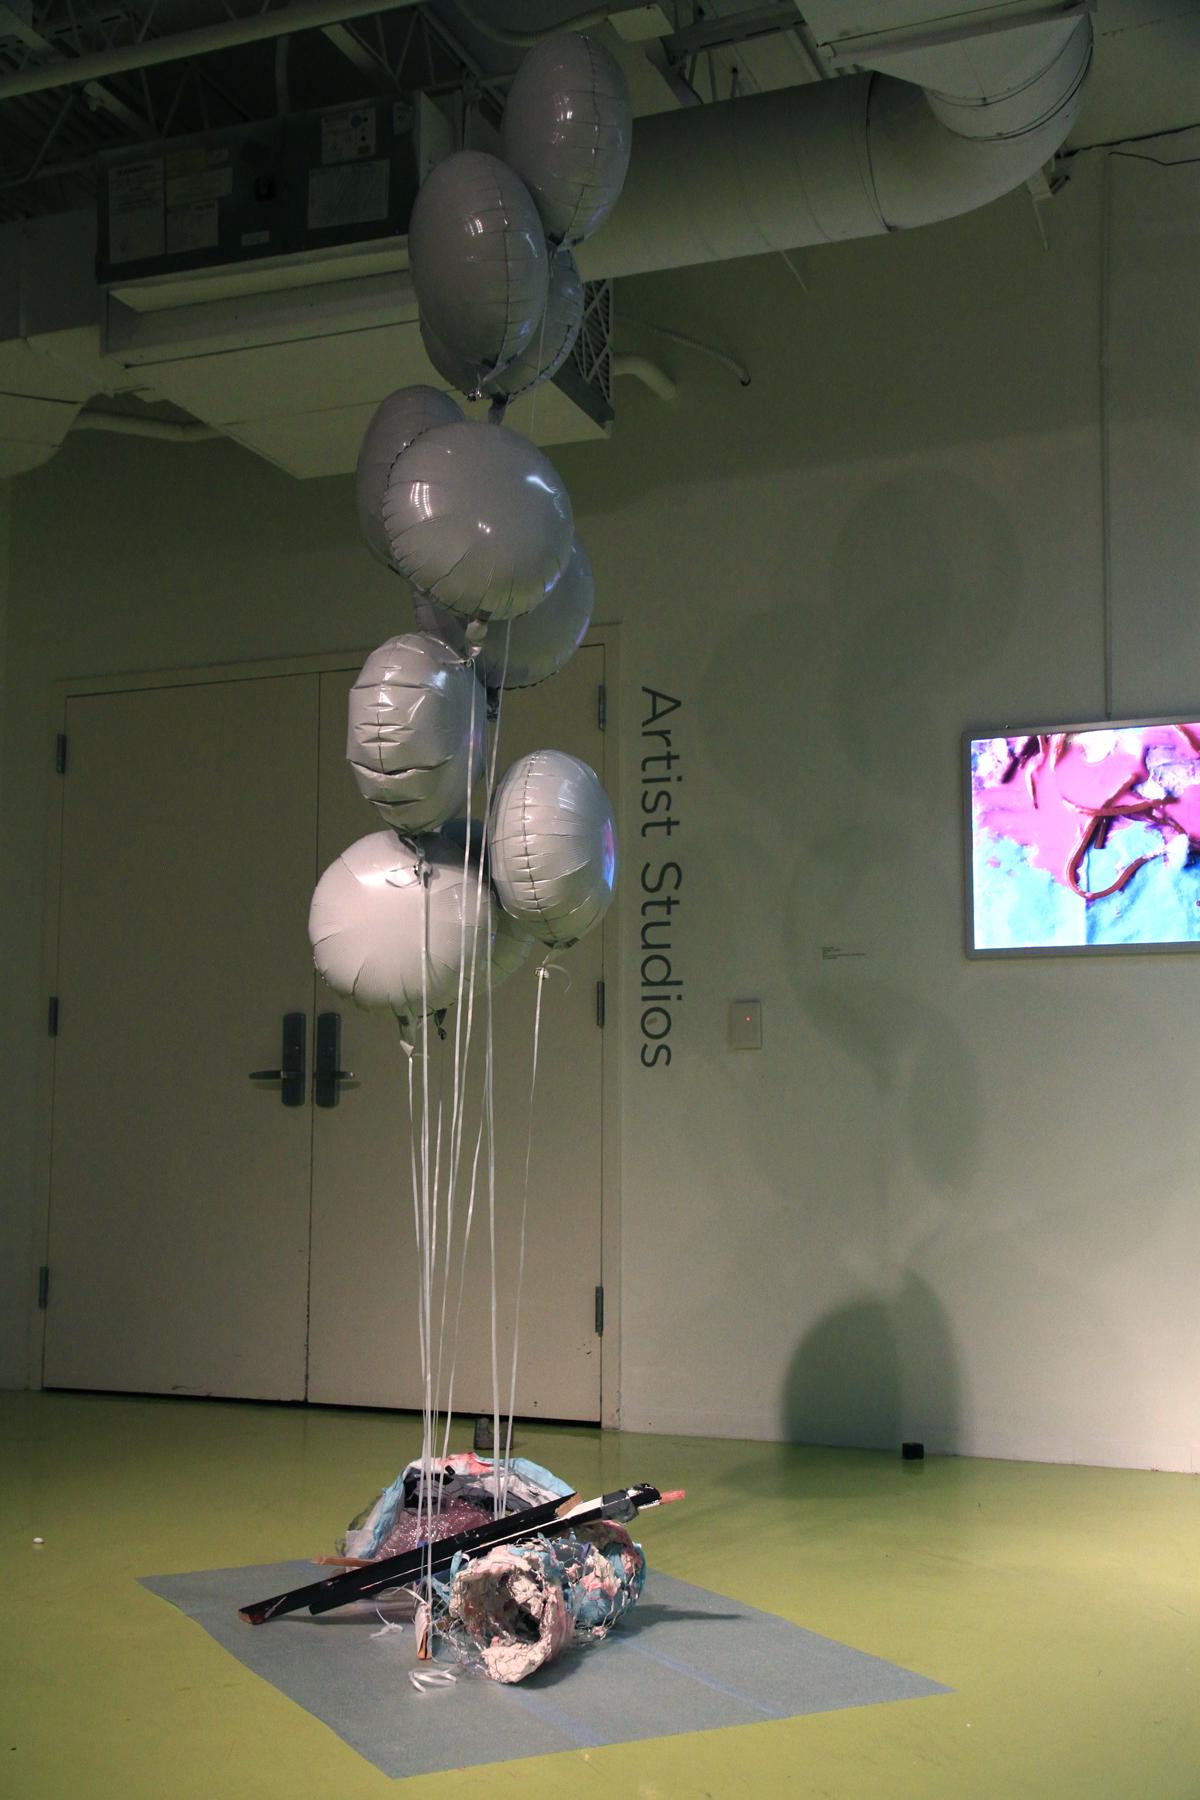 Balloons_tall.jpg